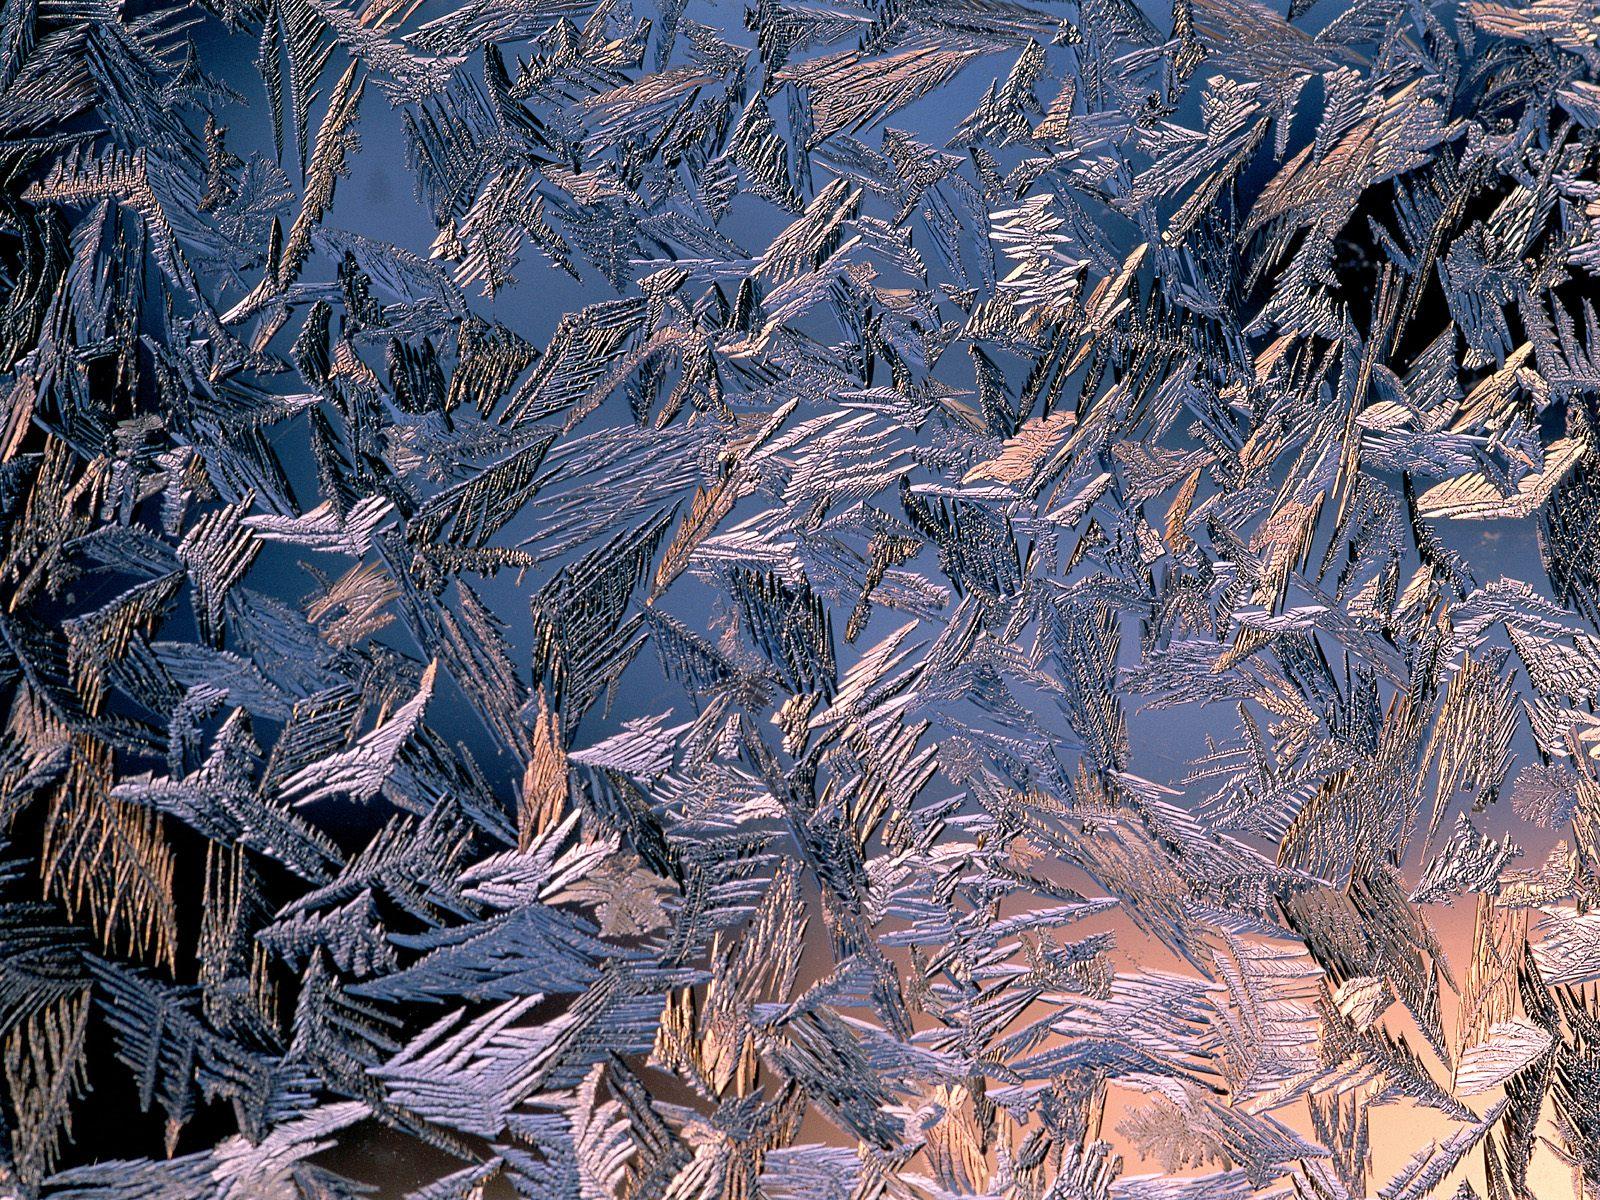 1600x1200 Morning frost desktop PC and Mac wallpaper 1600x1200